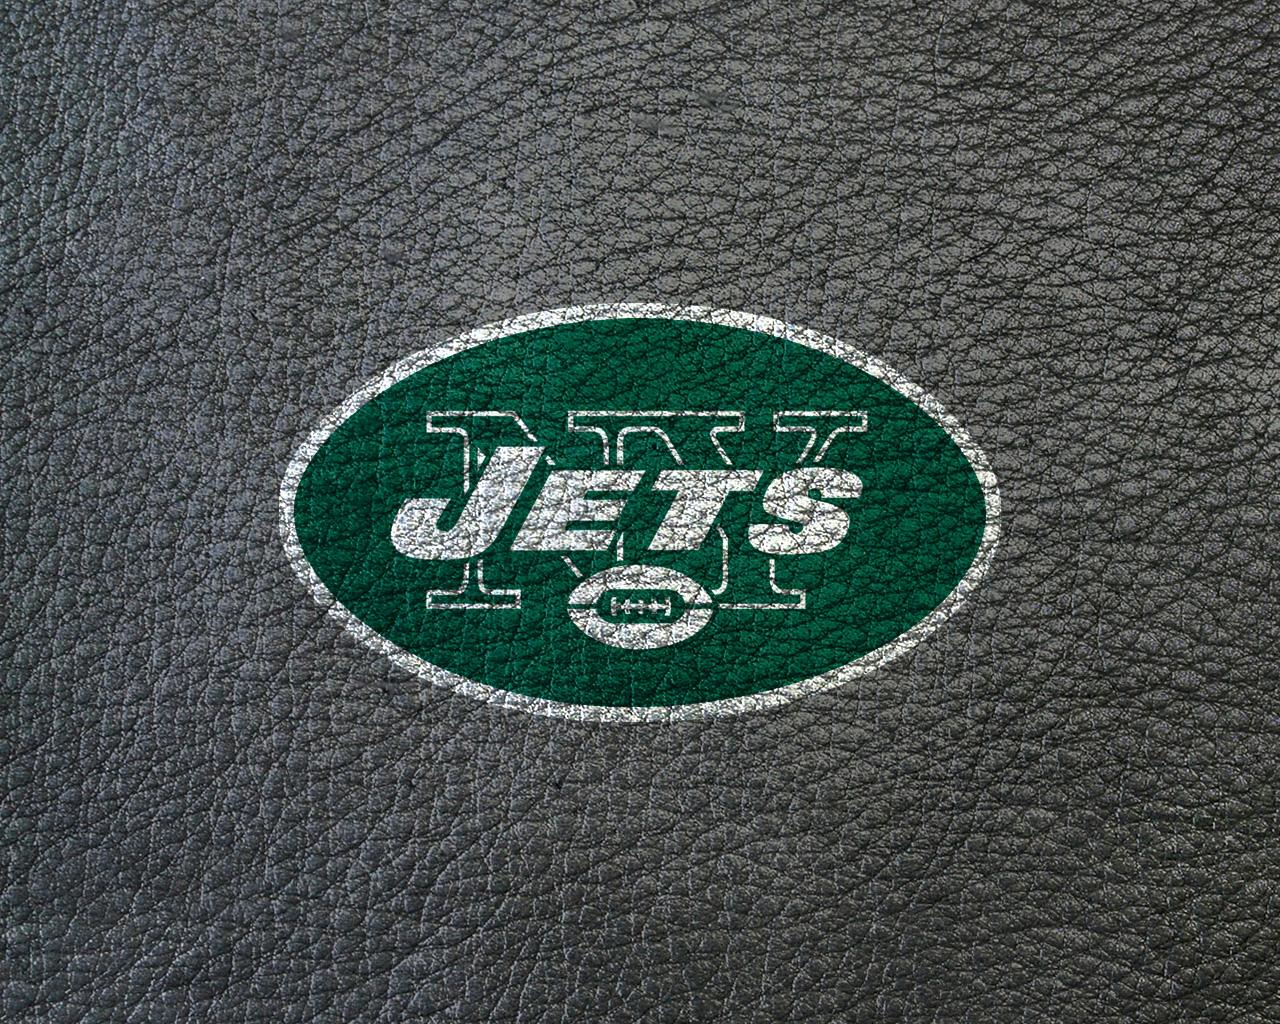 New York Jets 3d Logo Wallpaper 1280×960. Share this wallpaper